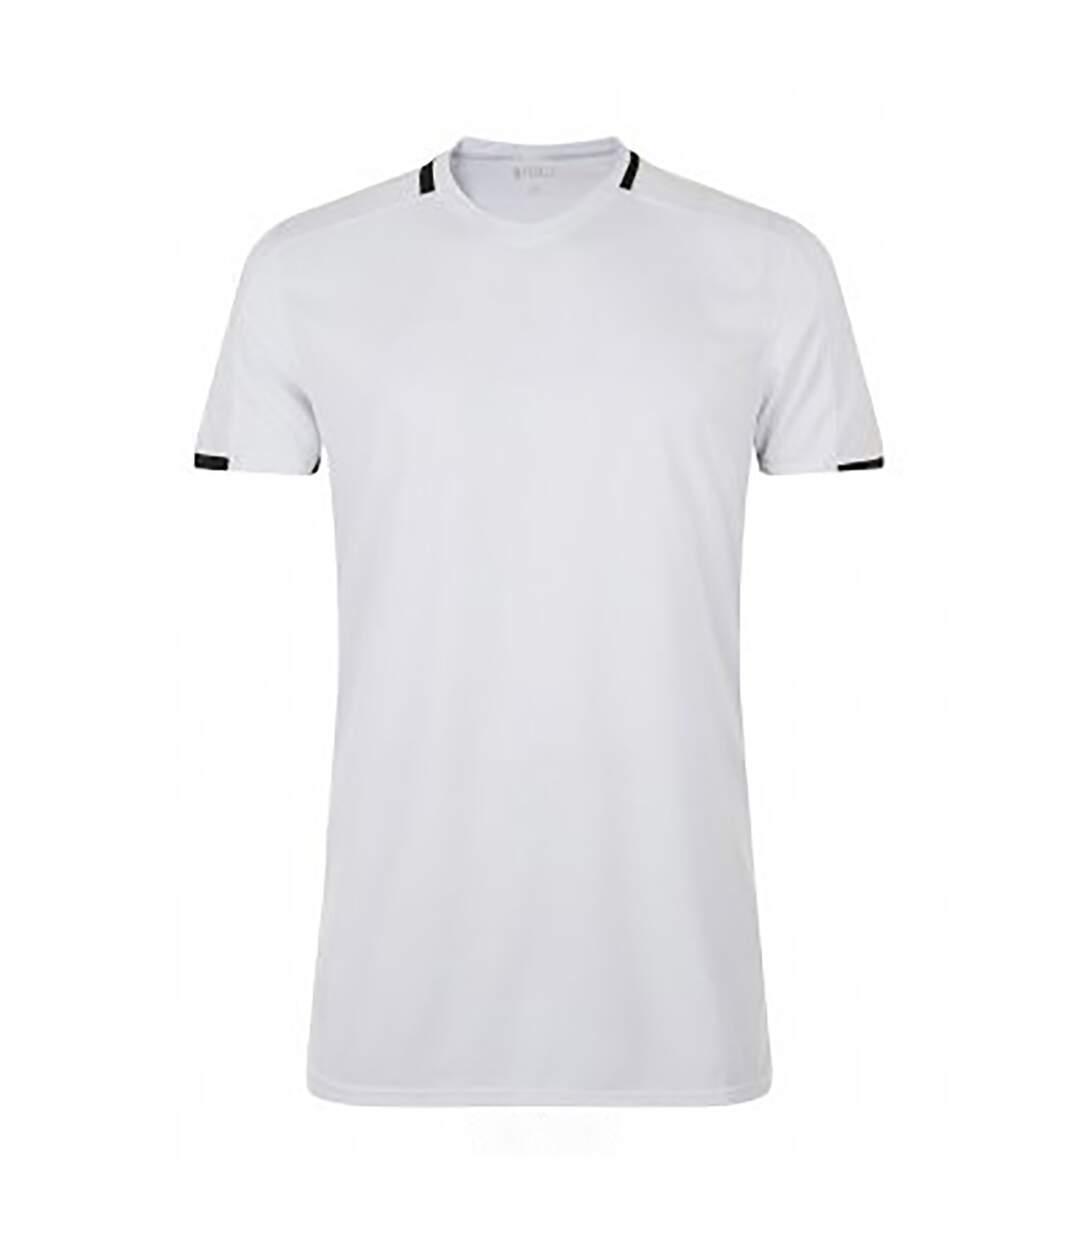 SOLS Mens Classico Contrast Short Sleeve Football T-Shirt (White/Black) - UTPC2787